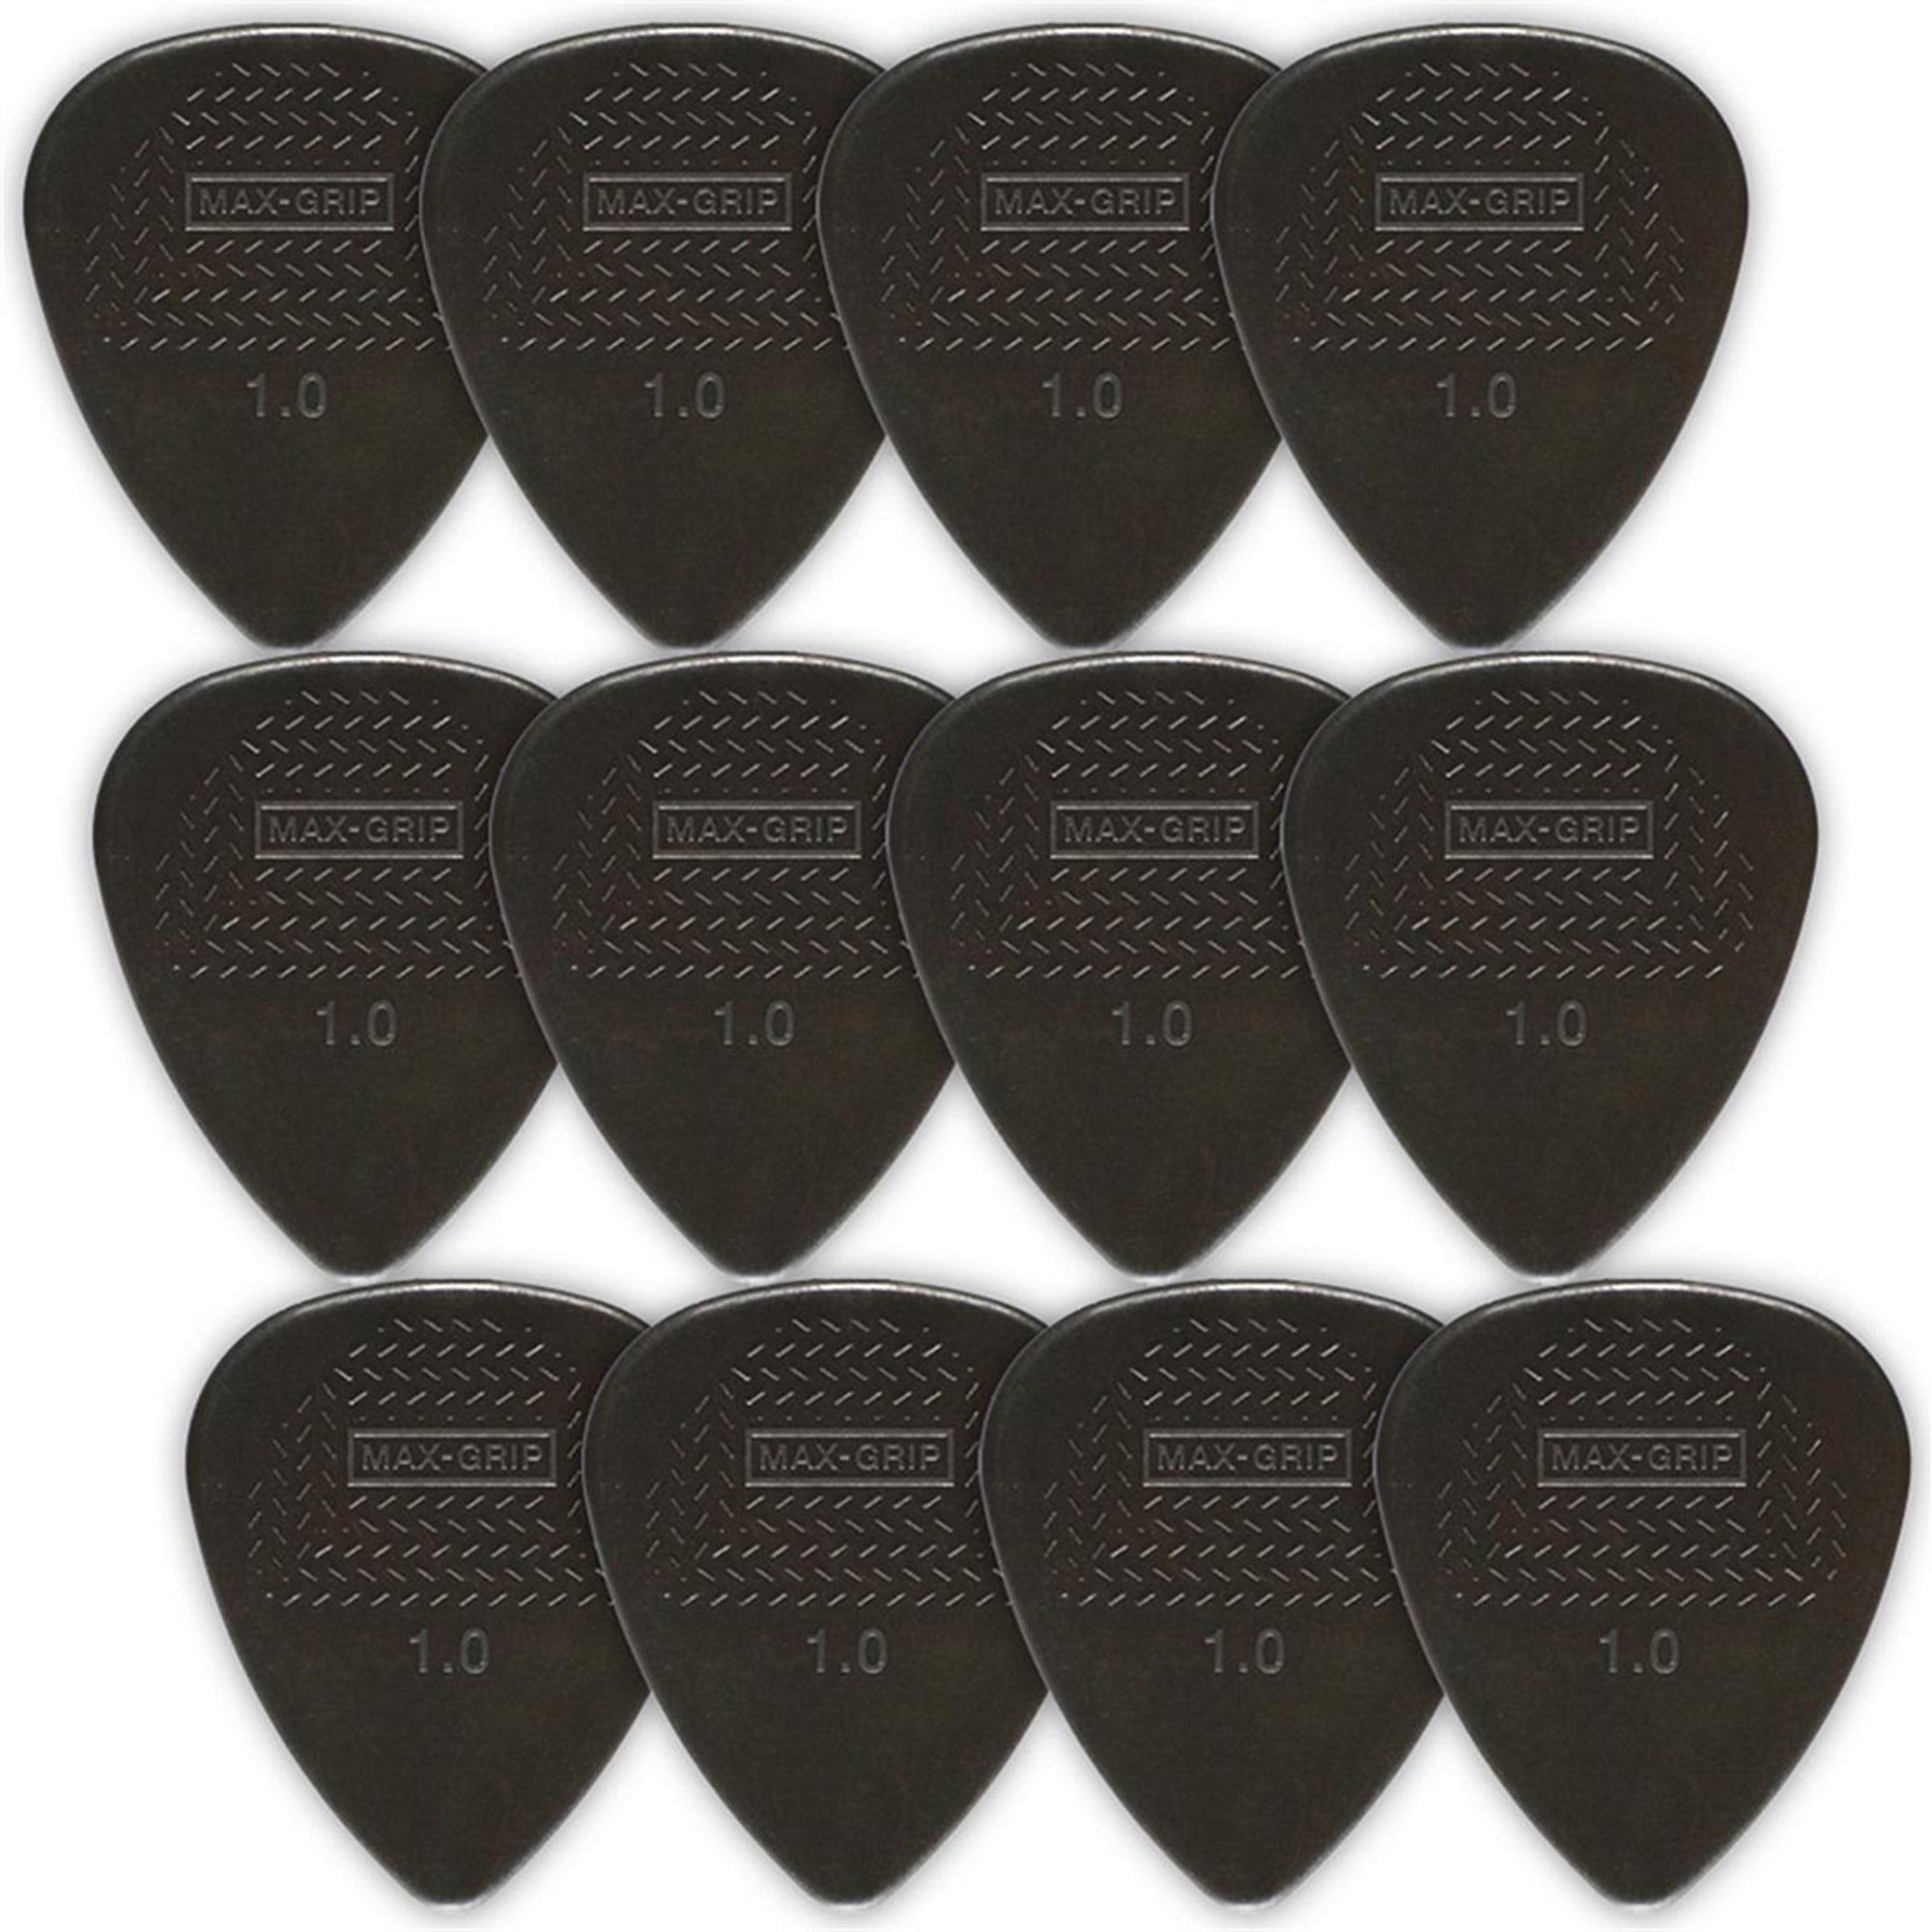 Dunlop Nylon Standard Guitar Picks, 12-Pack, 1.0mm, Black by Dunlop